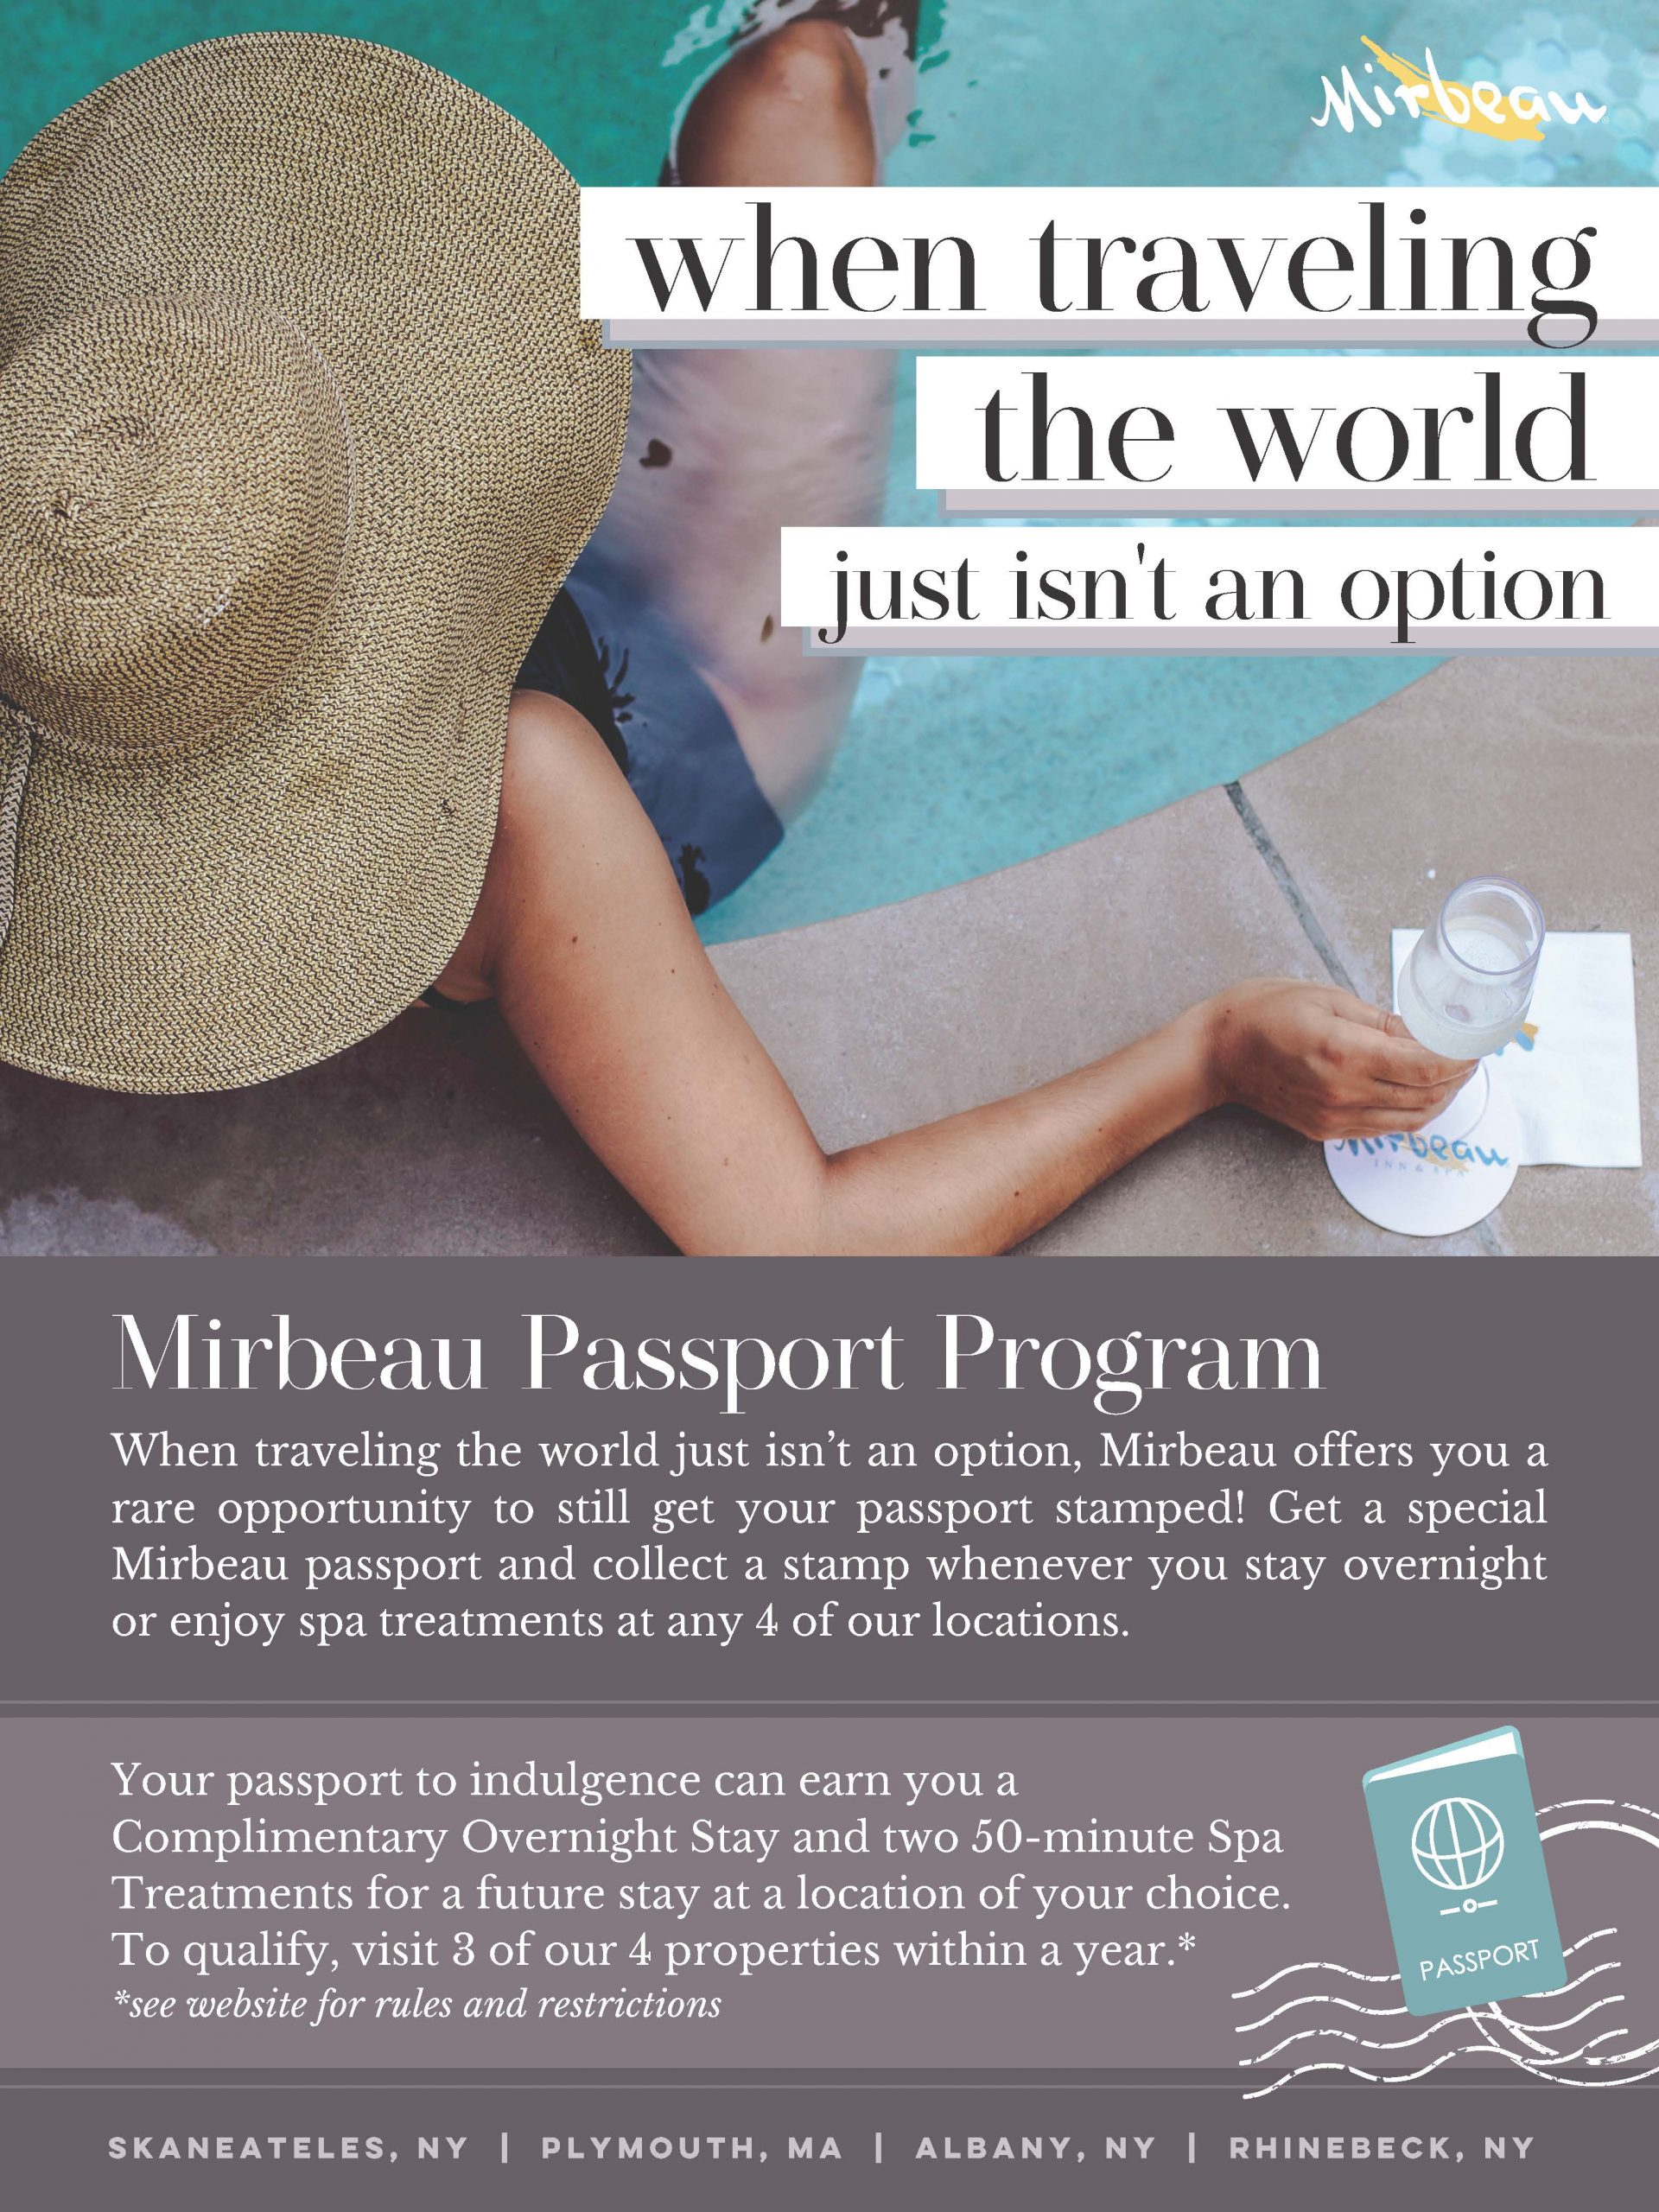 Spa MHS Passport Program 18x24 1